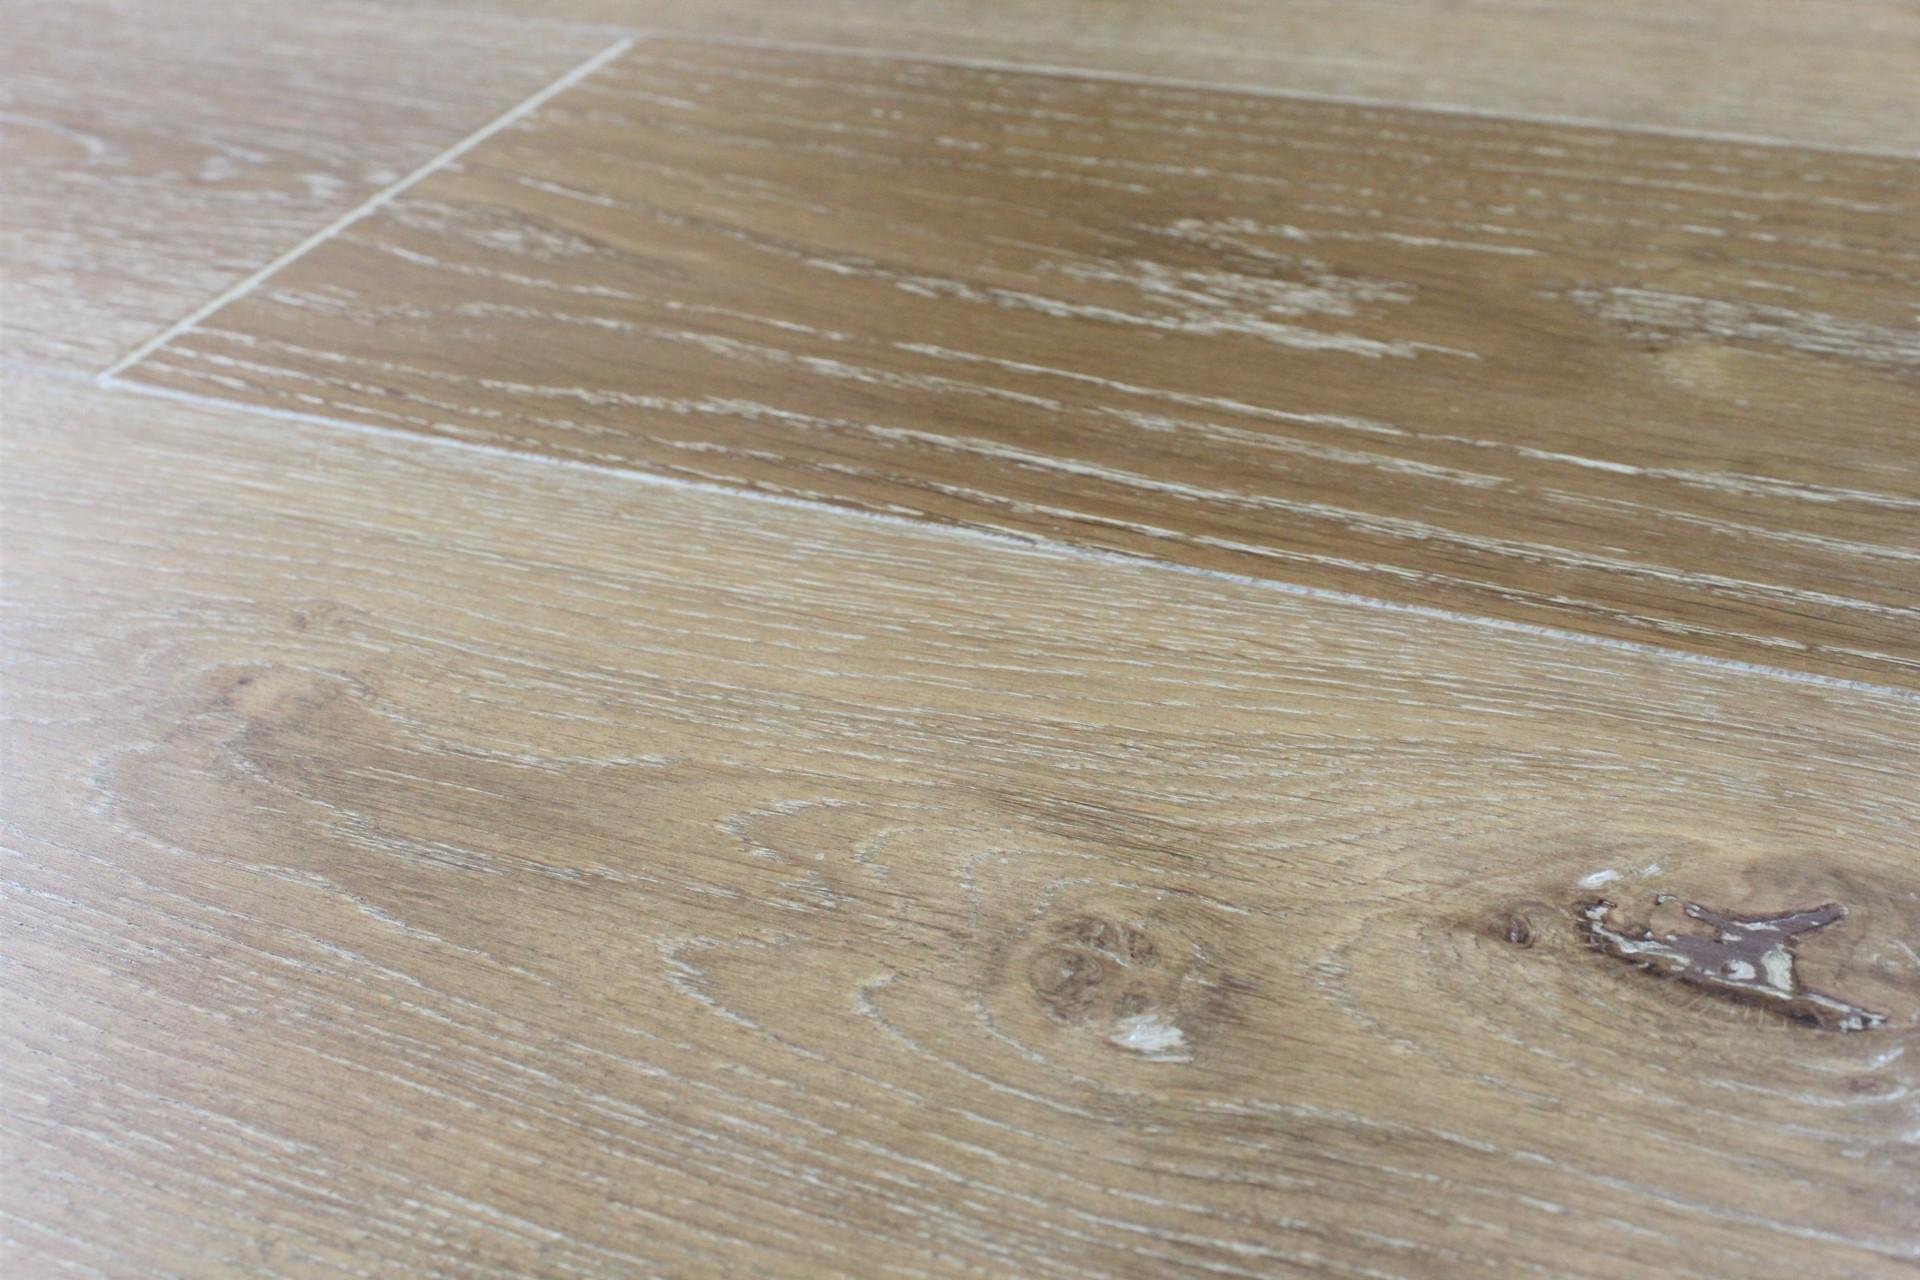 Hardwood, prefinished floor, engineered wood, solid wood, lifestyle, hard surface, prefinished hardwood, prefinished wood, home, design, interior design, wood floor design, johnson hardwood